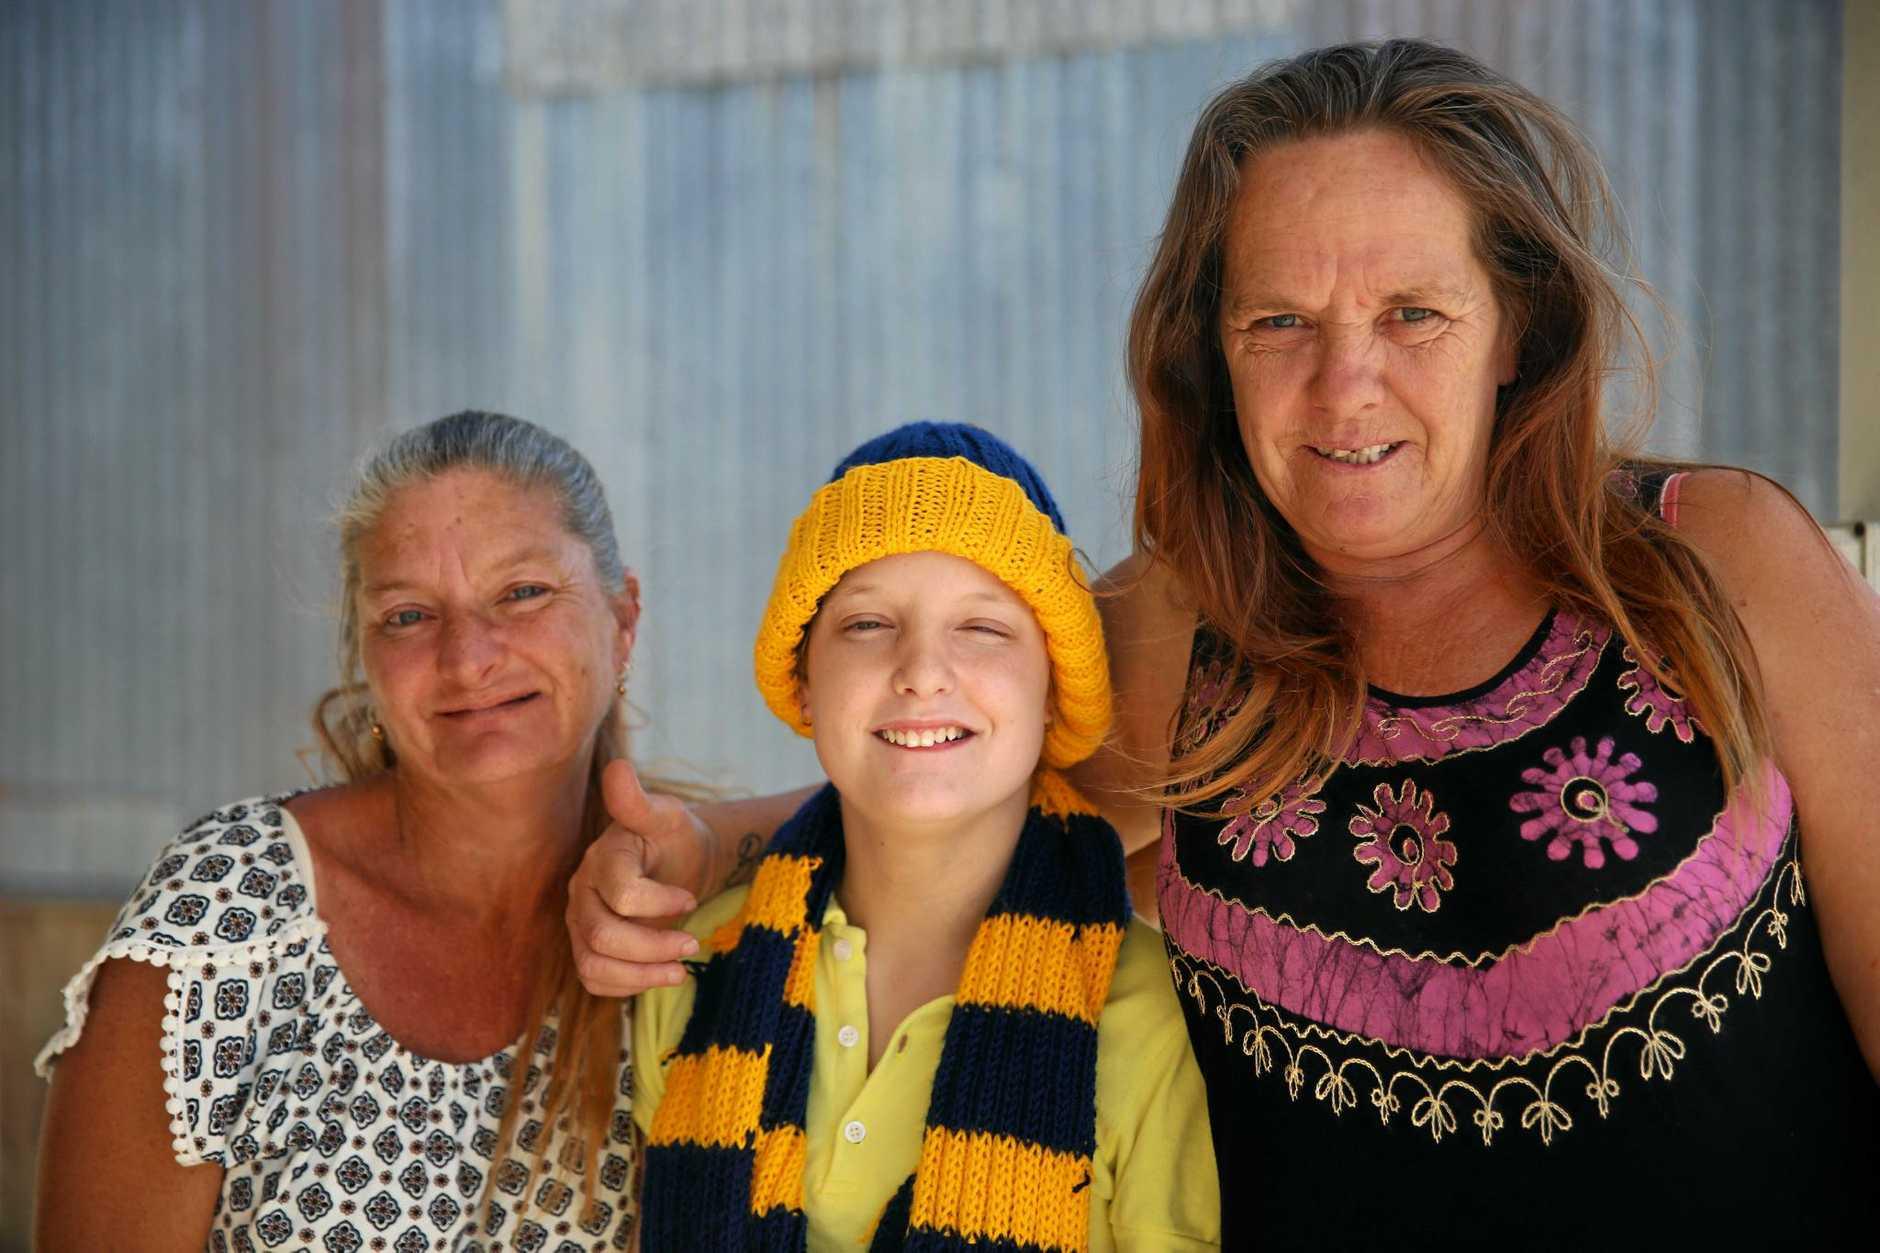 Shelley Evans, her daughter Gemma, and friend Lisa Kent.